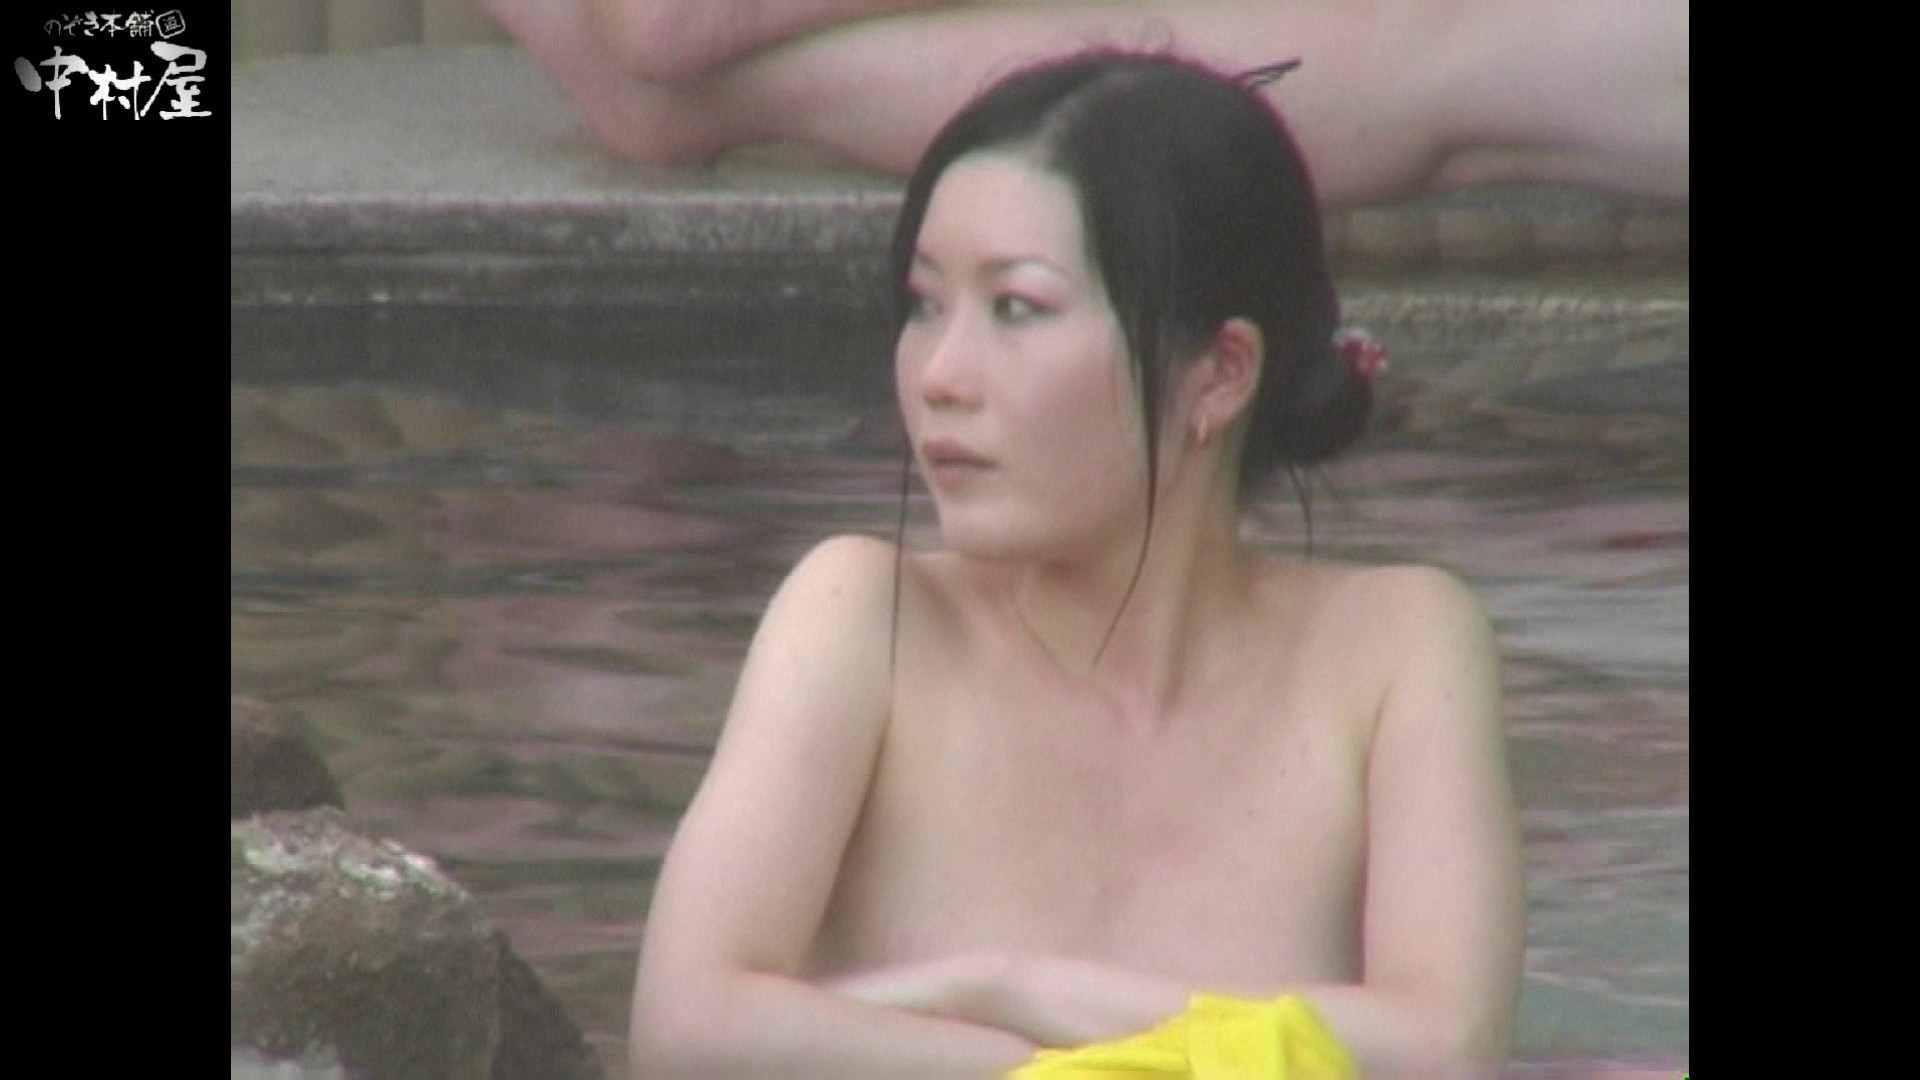 Aquaな露天風呂Vol.940 OLセックス  98画像 51